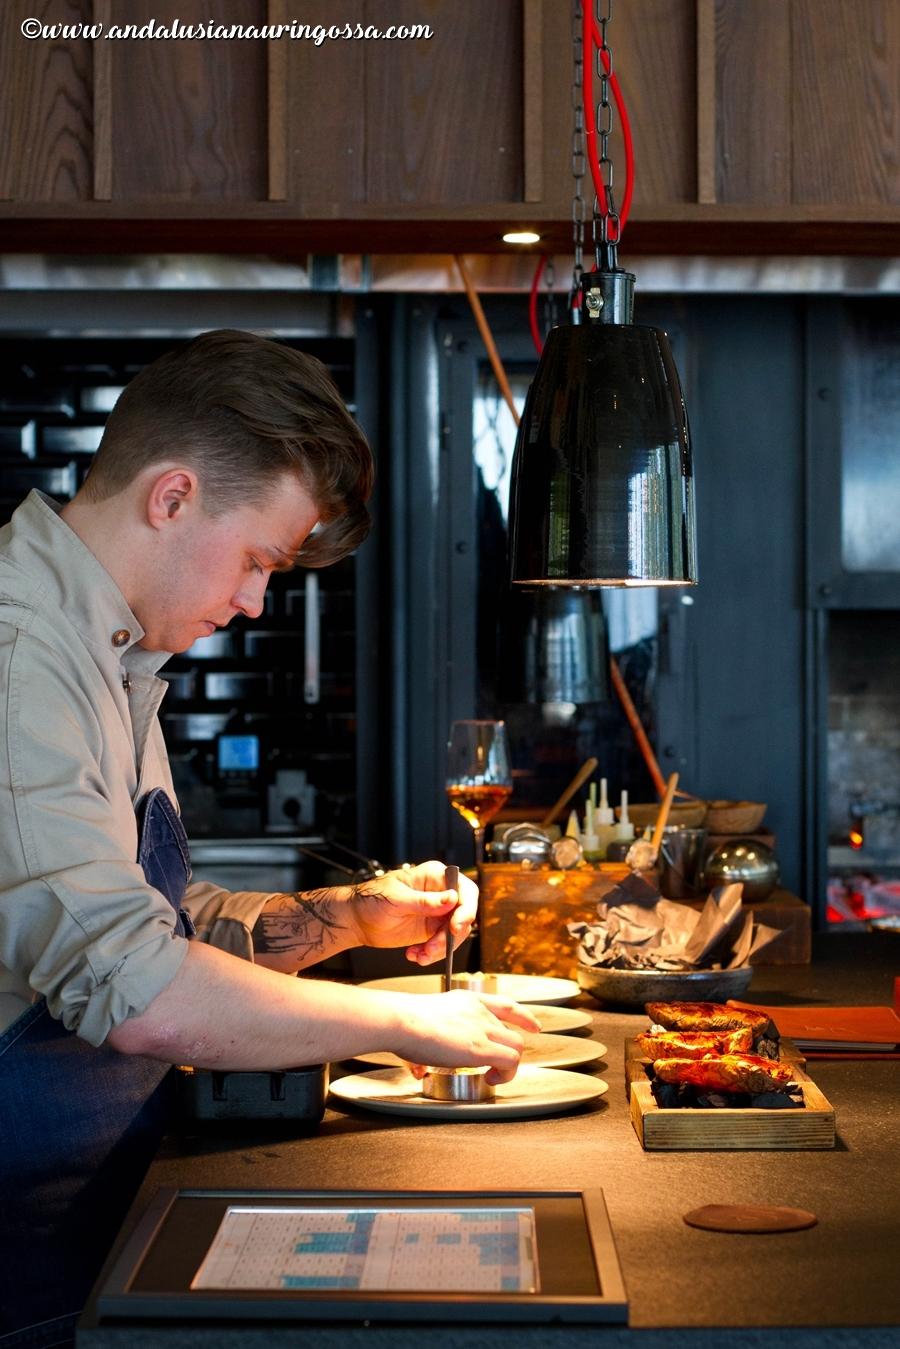 Restaurant Noa_Restoran Noa_Best restaurants in Tallinn_Andalusian Auringossa_foodblog_travelblog_13